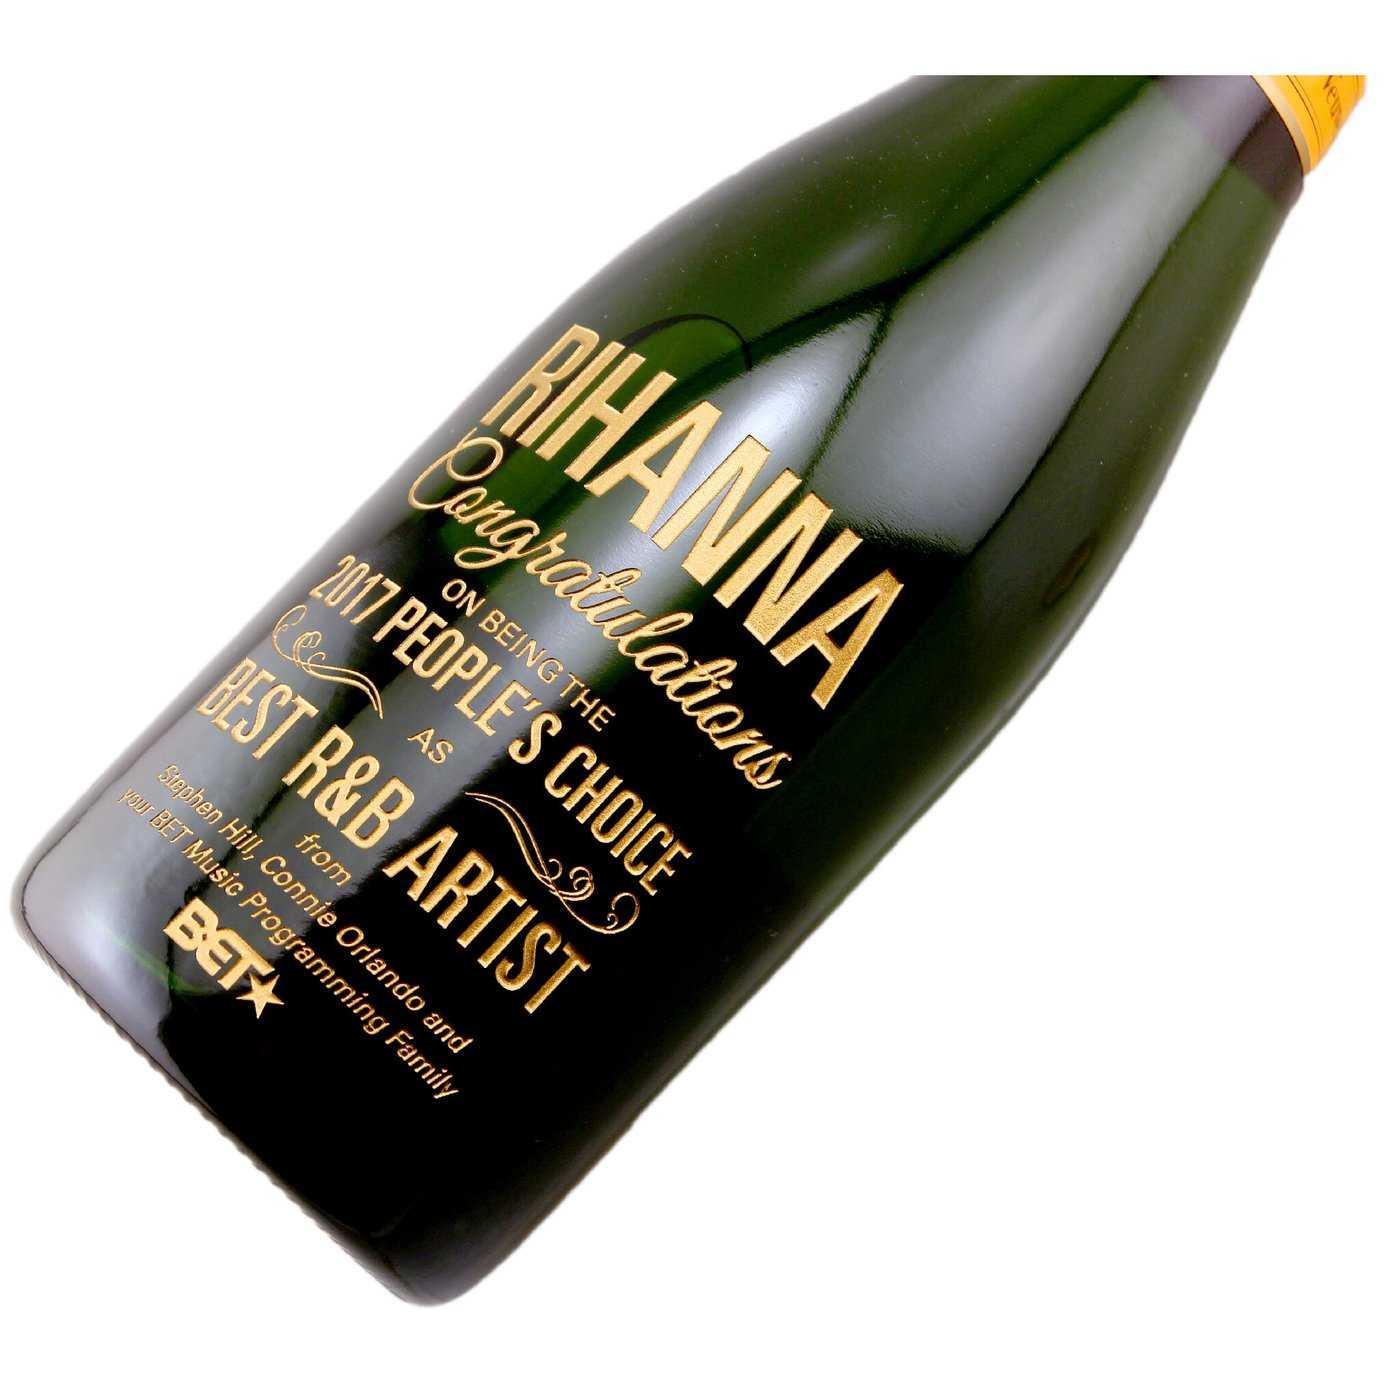 Congratulations Champagne Gift